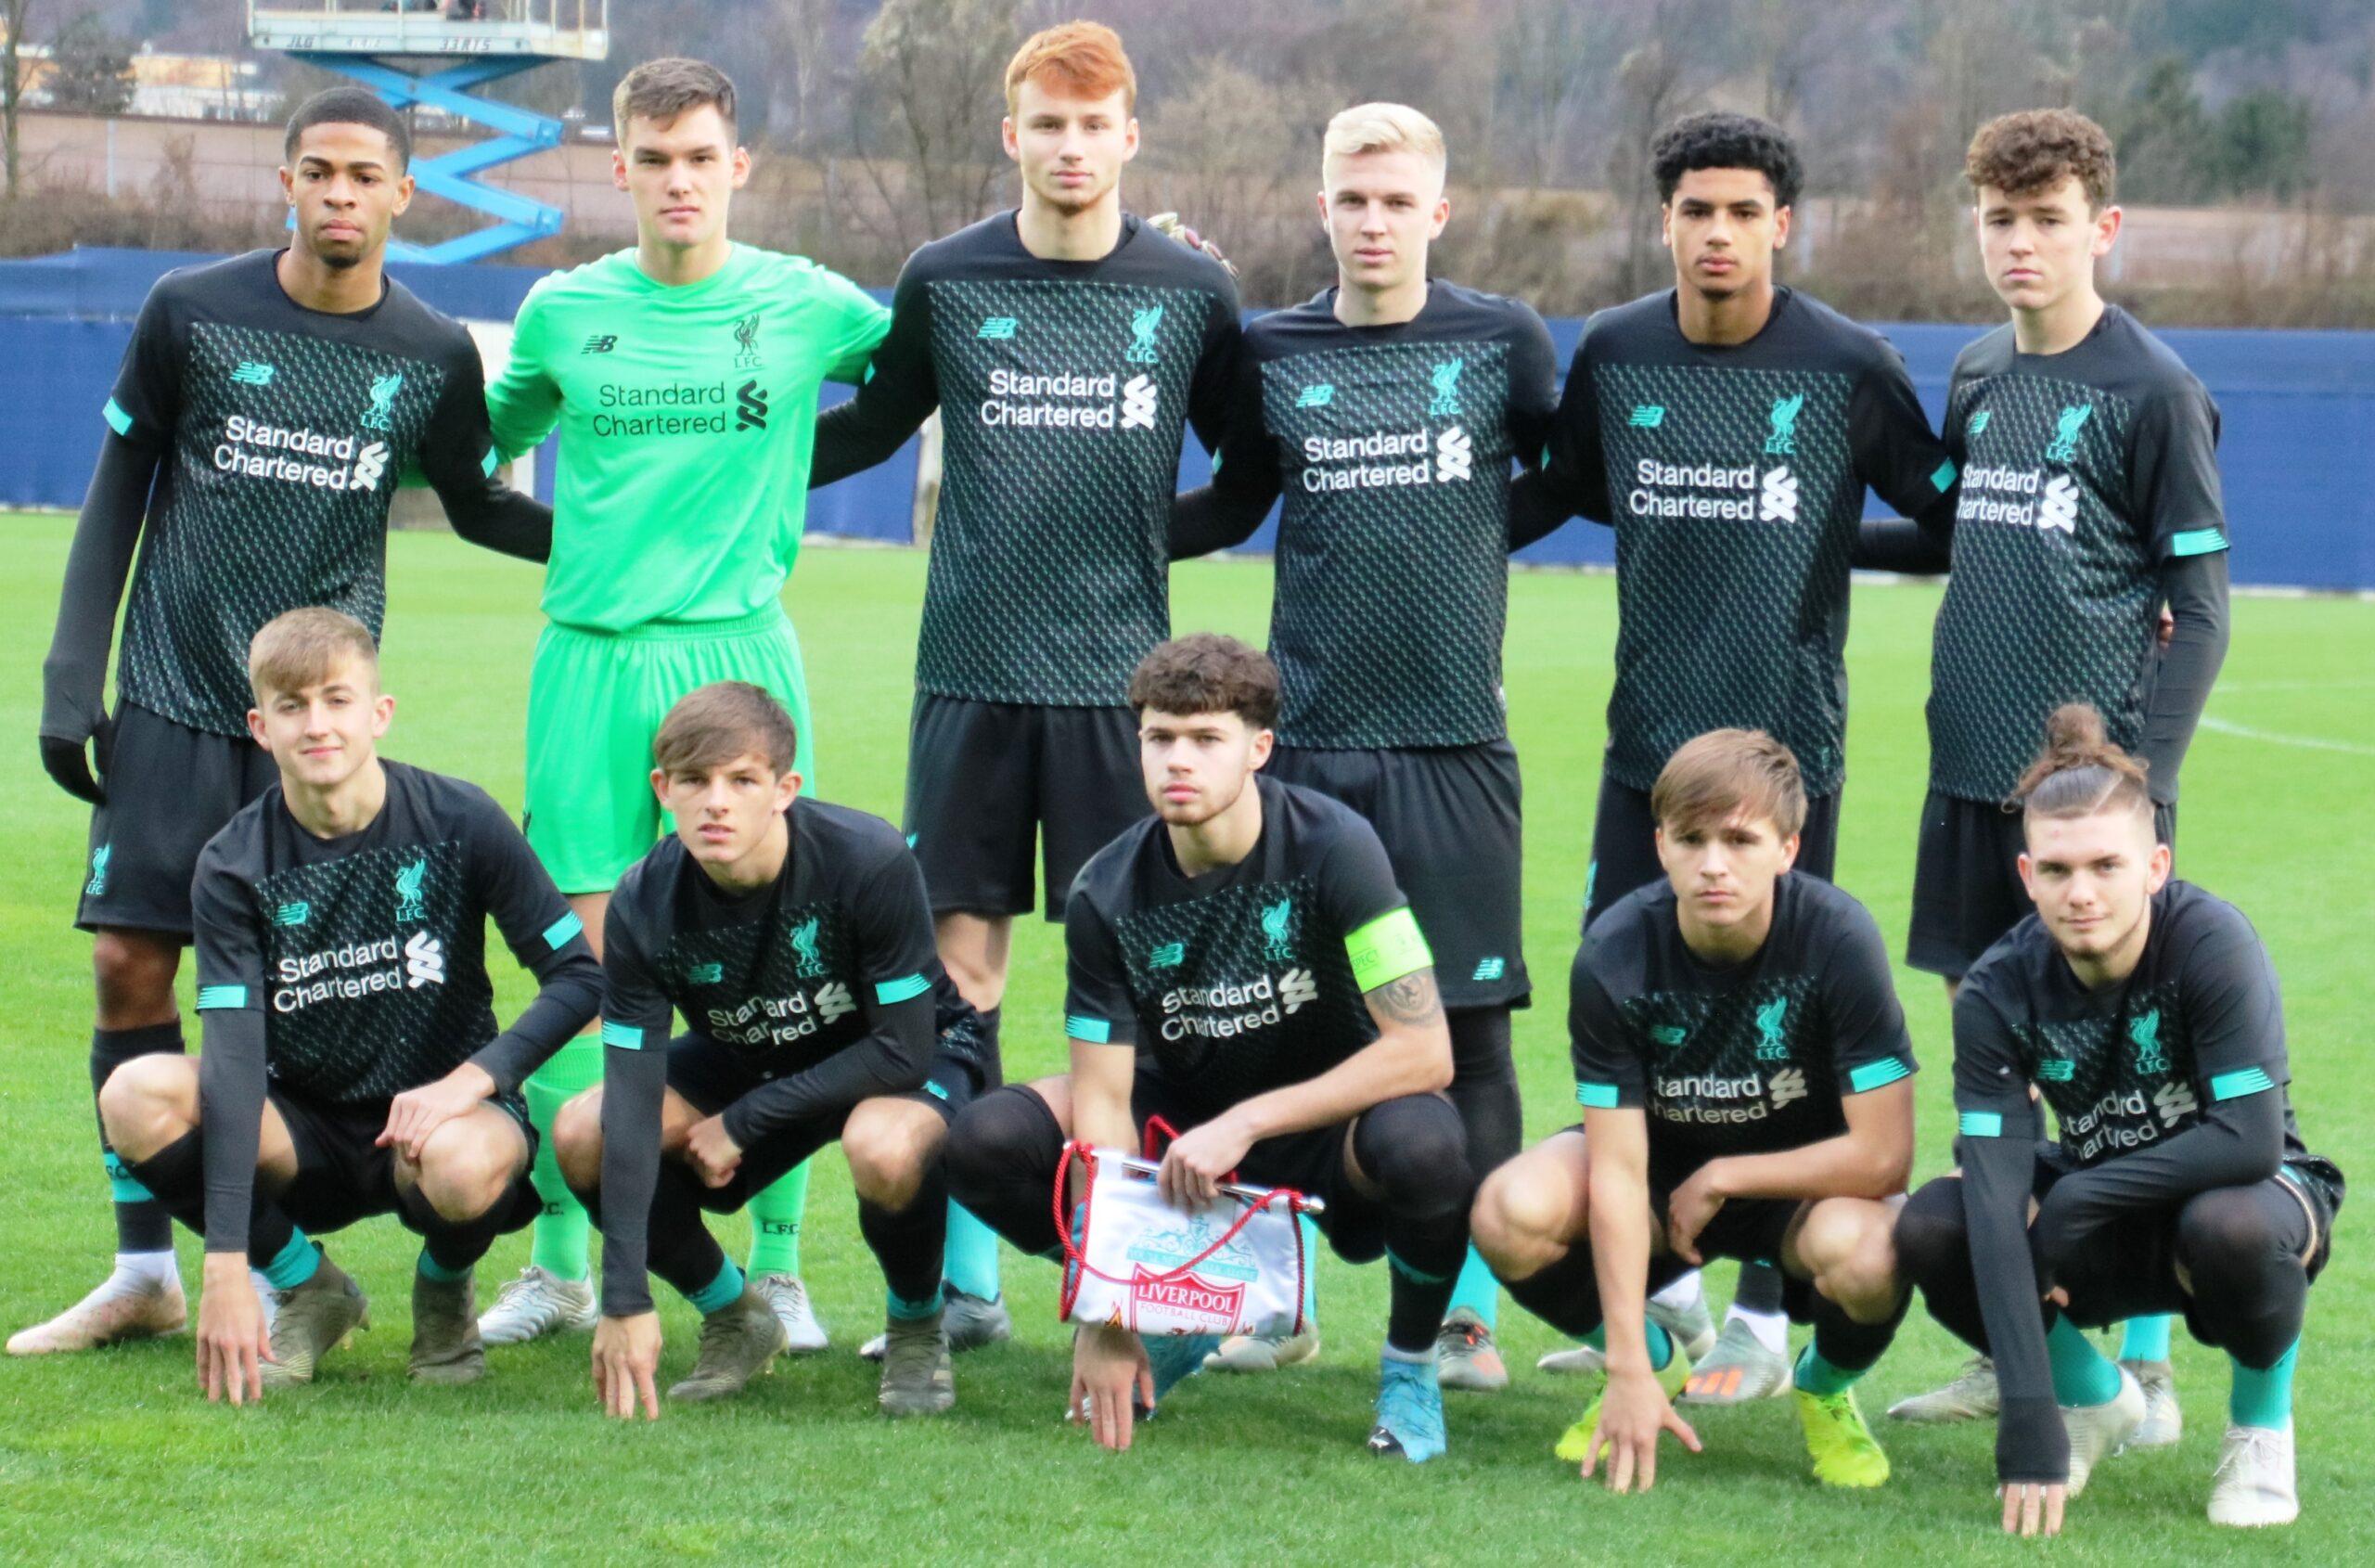 Future Stars of the Premier League